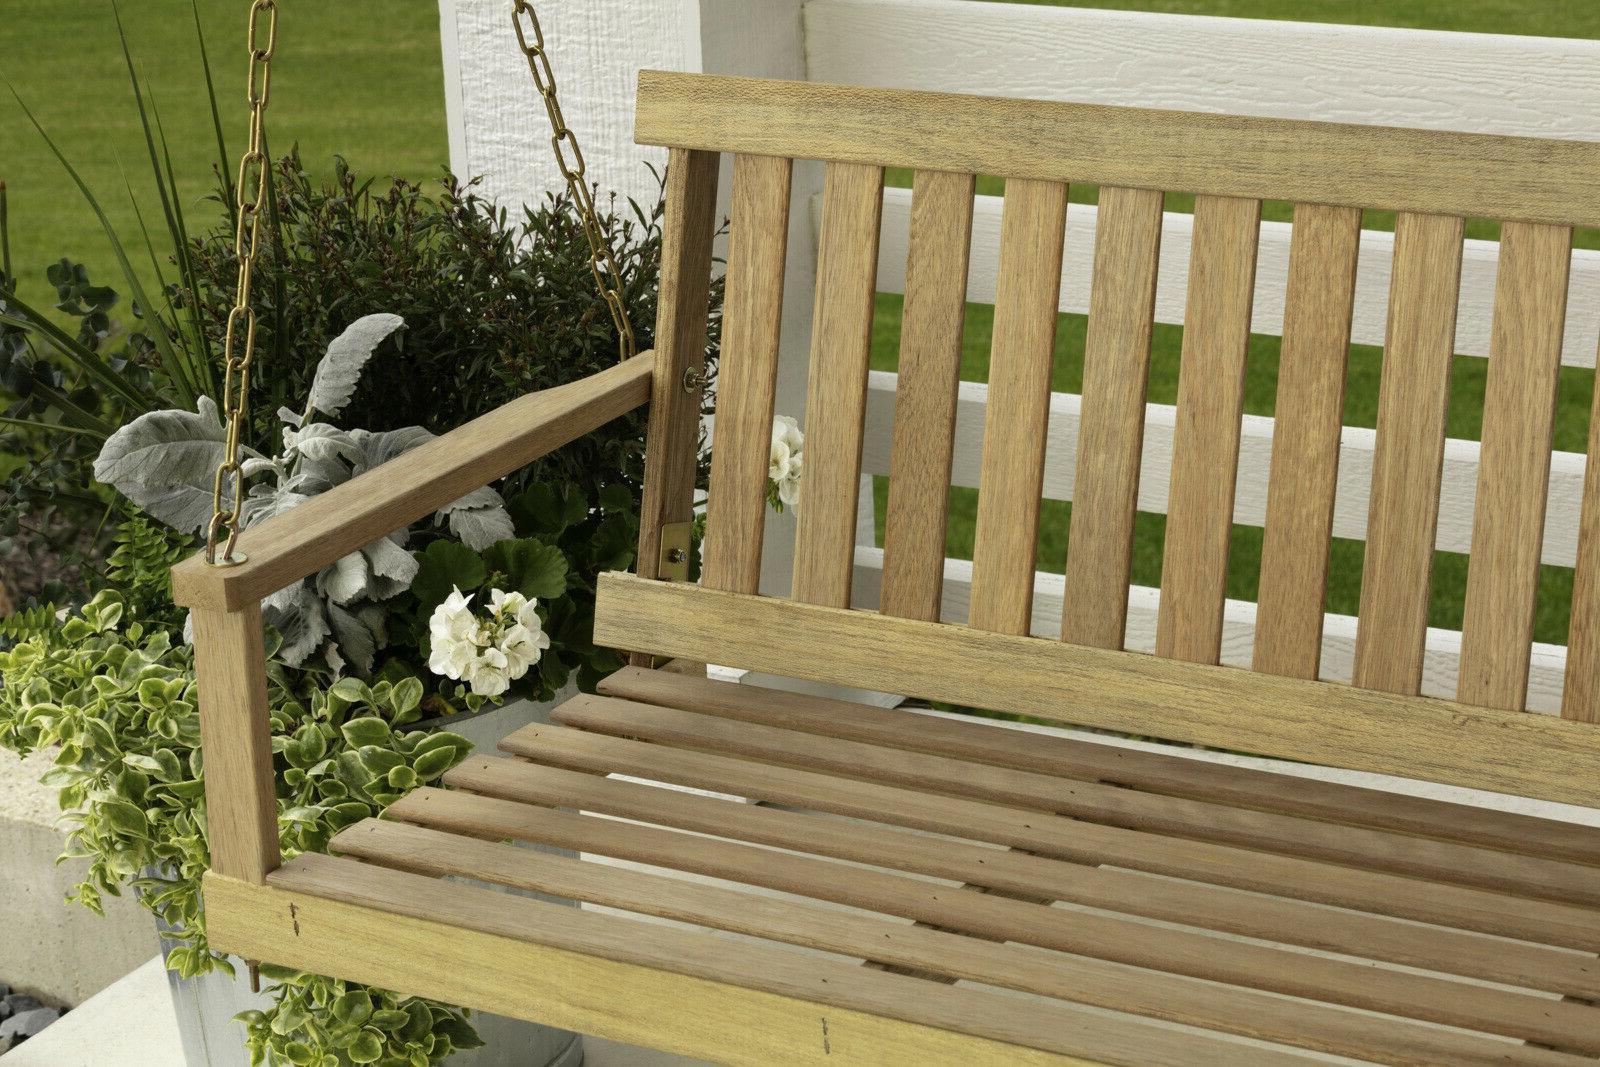 Wooden Porch Swing 5 ft Natural Wood Patio Outdoor Yard Gard